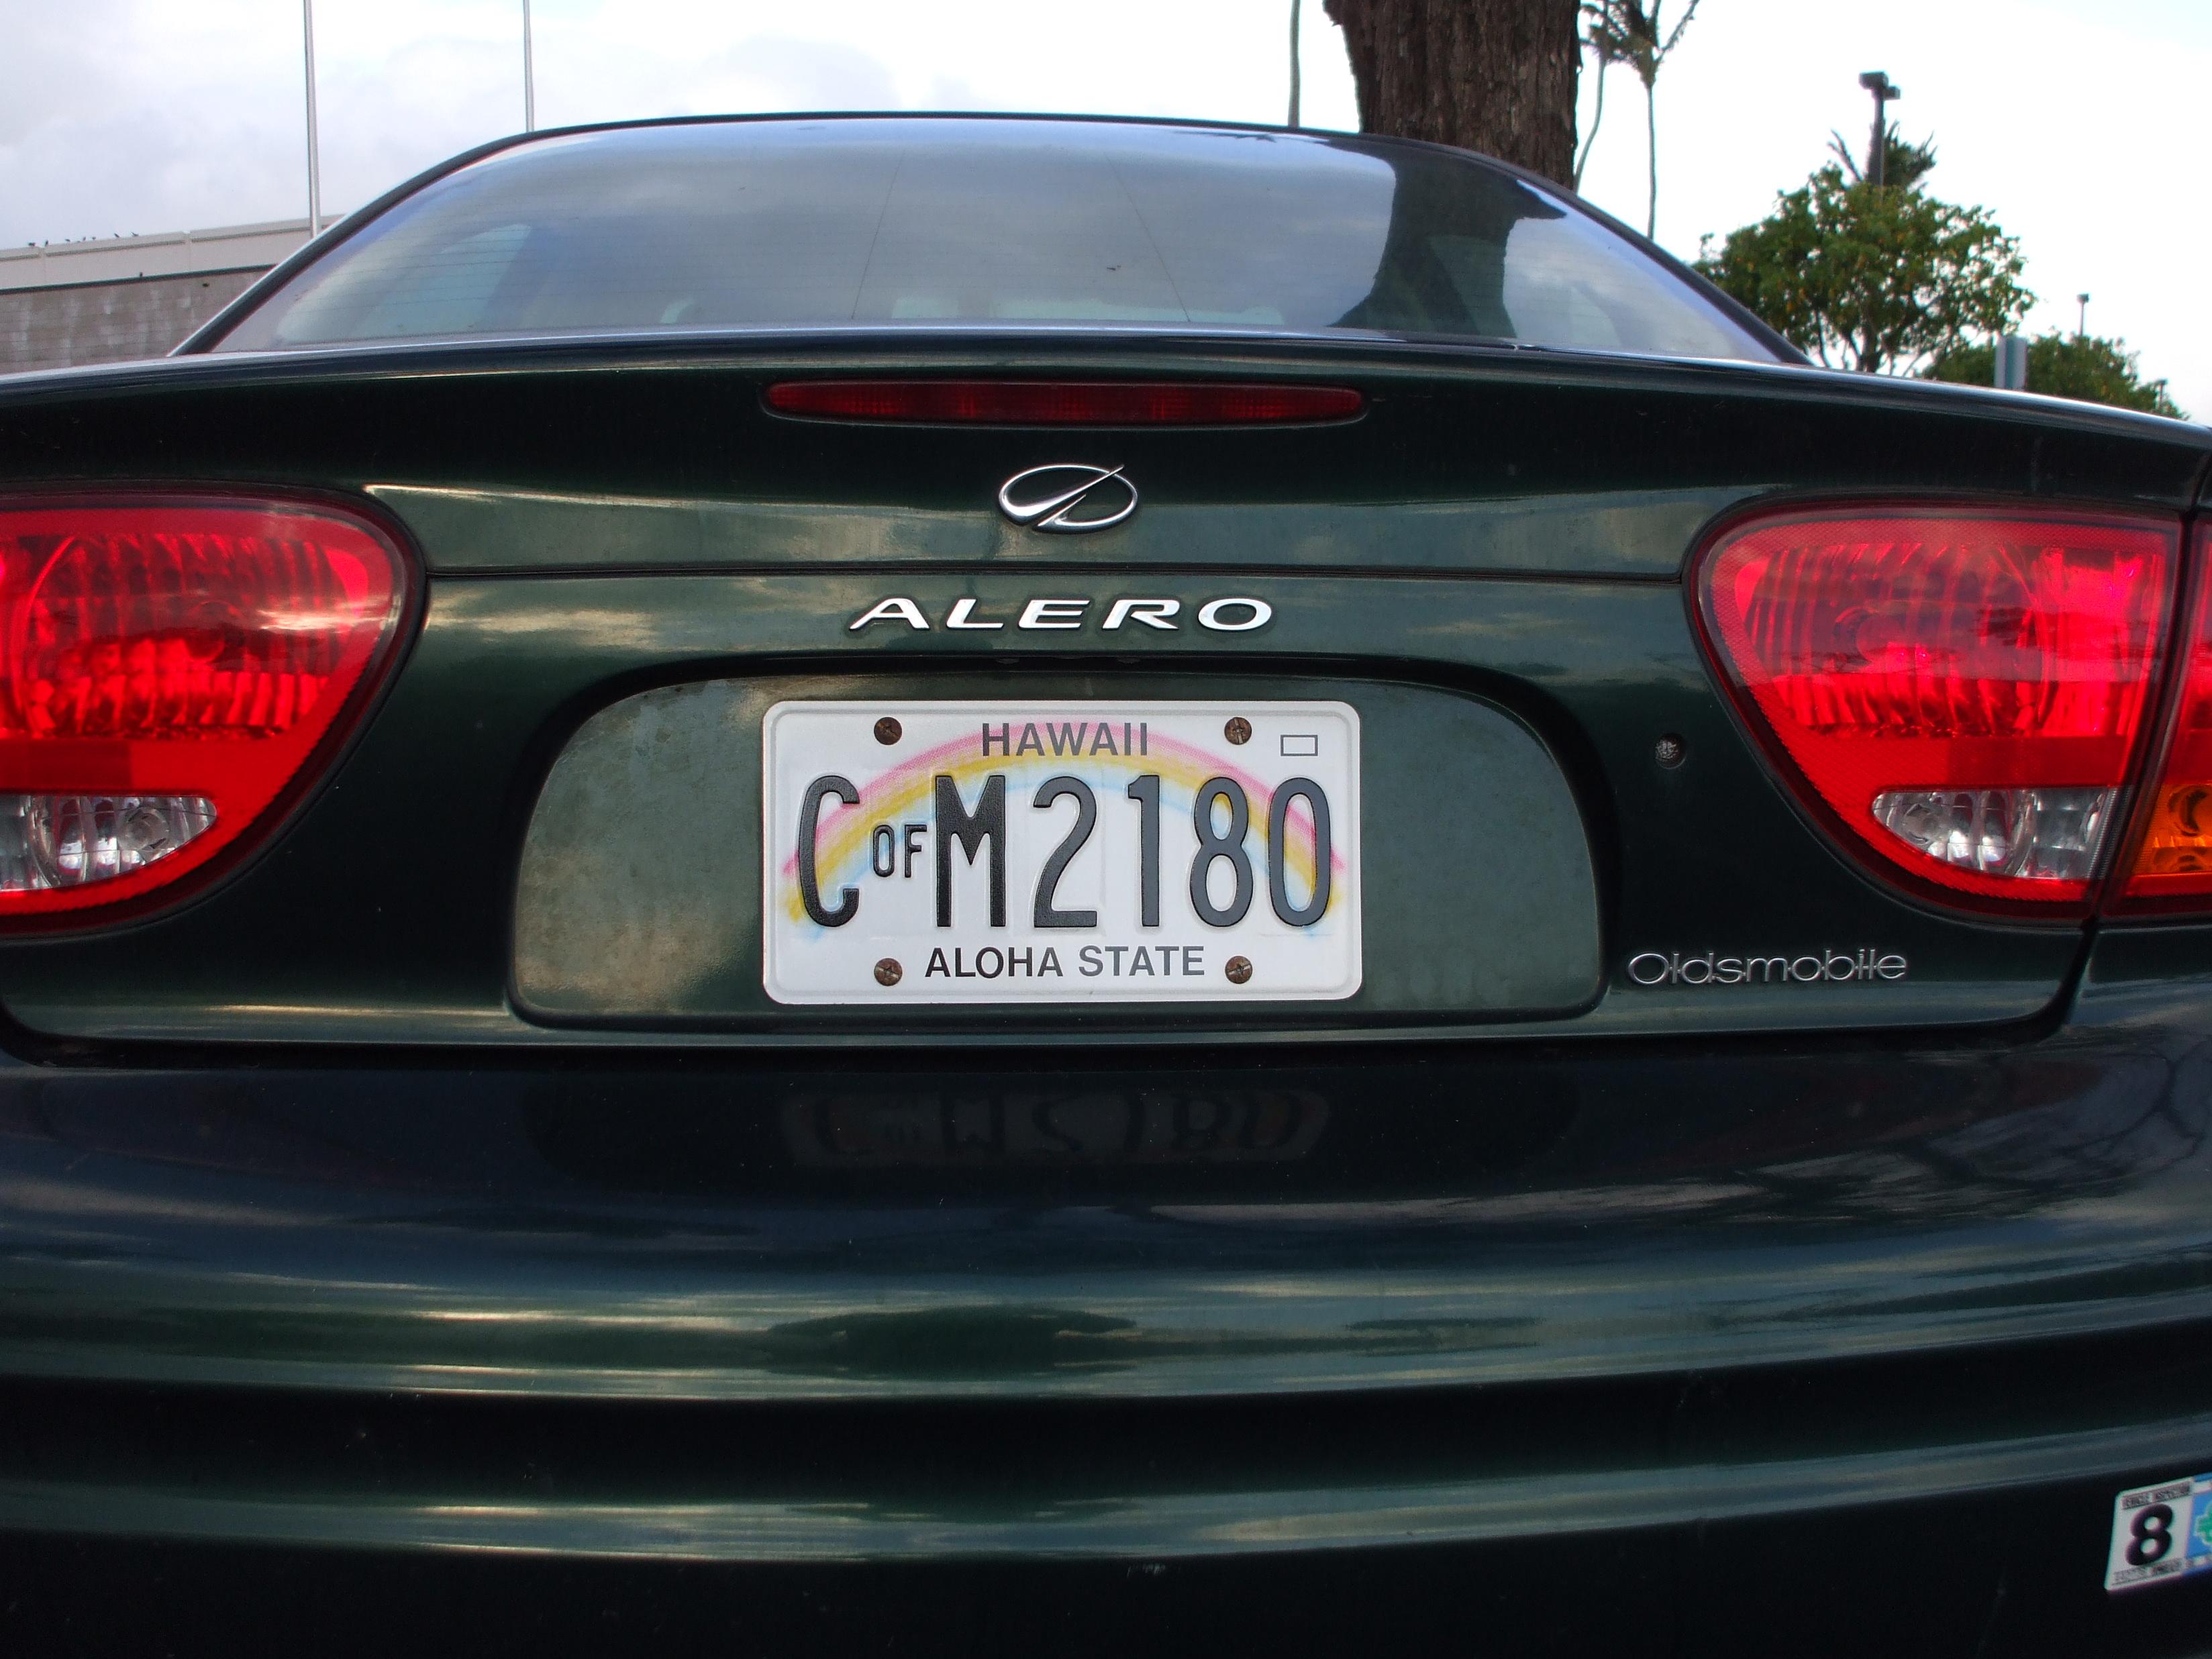 File:County of Maui, Hawaii vehicle CofM license plate.jpg ...